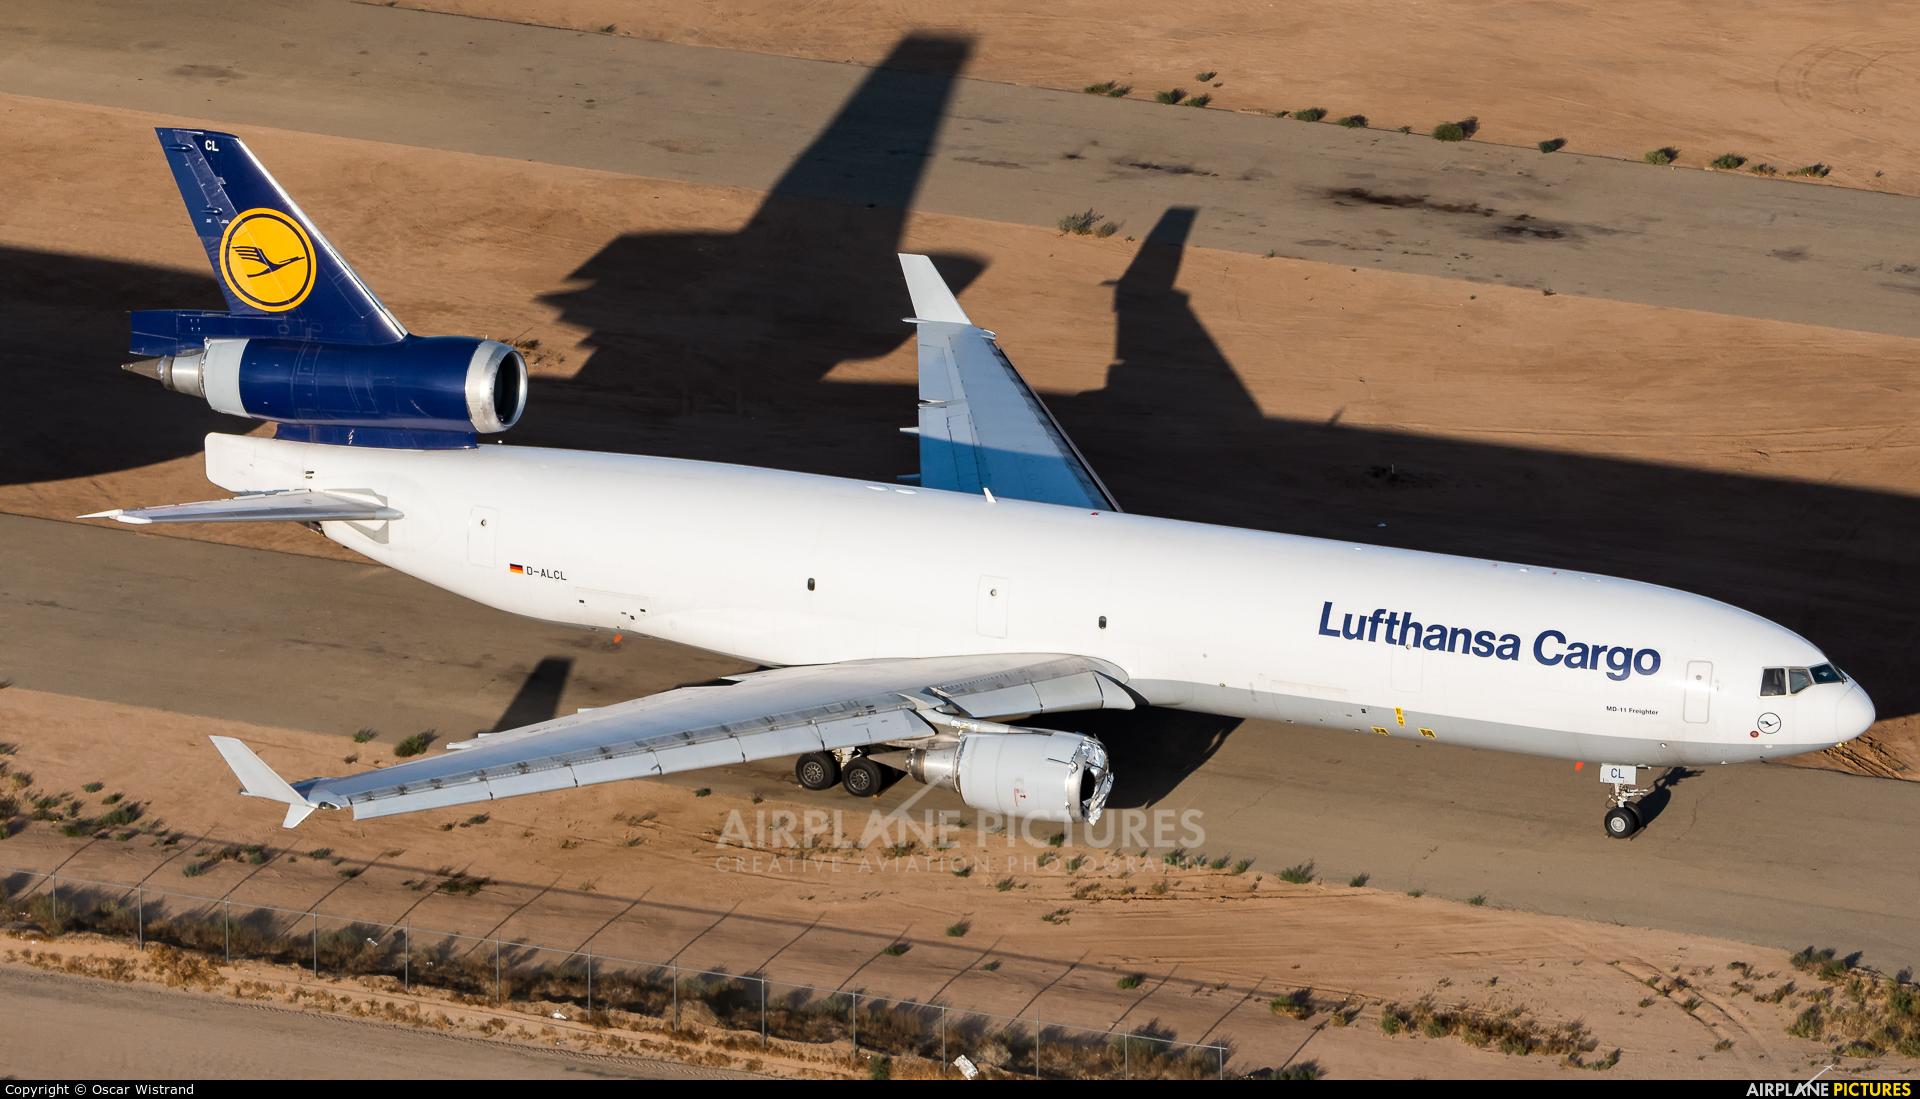 Lufthansa Cargo D-ALCL aircraft at Victorville - Southern California Logistics